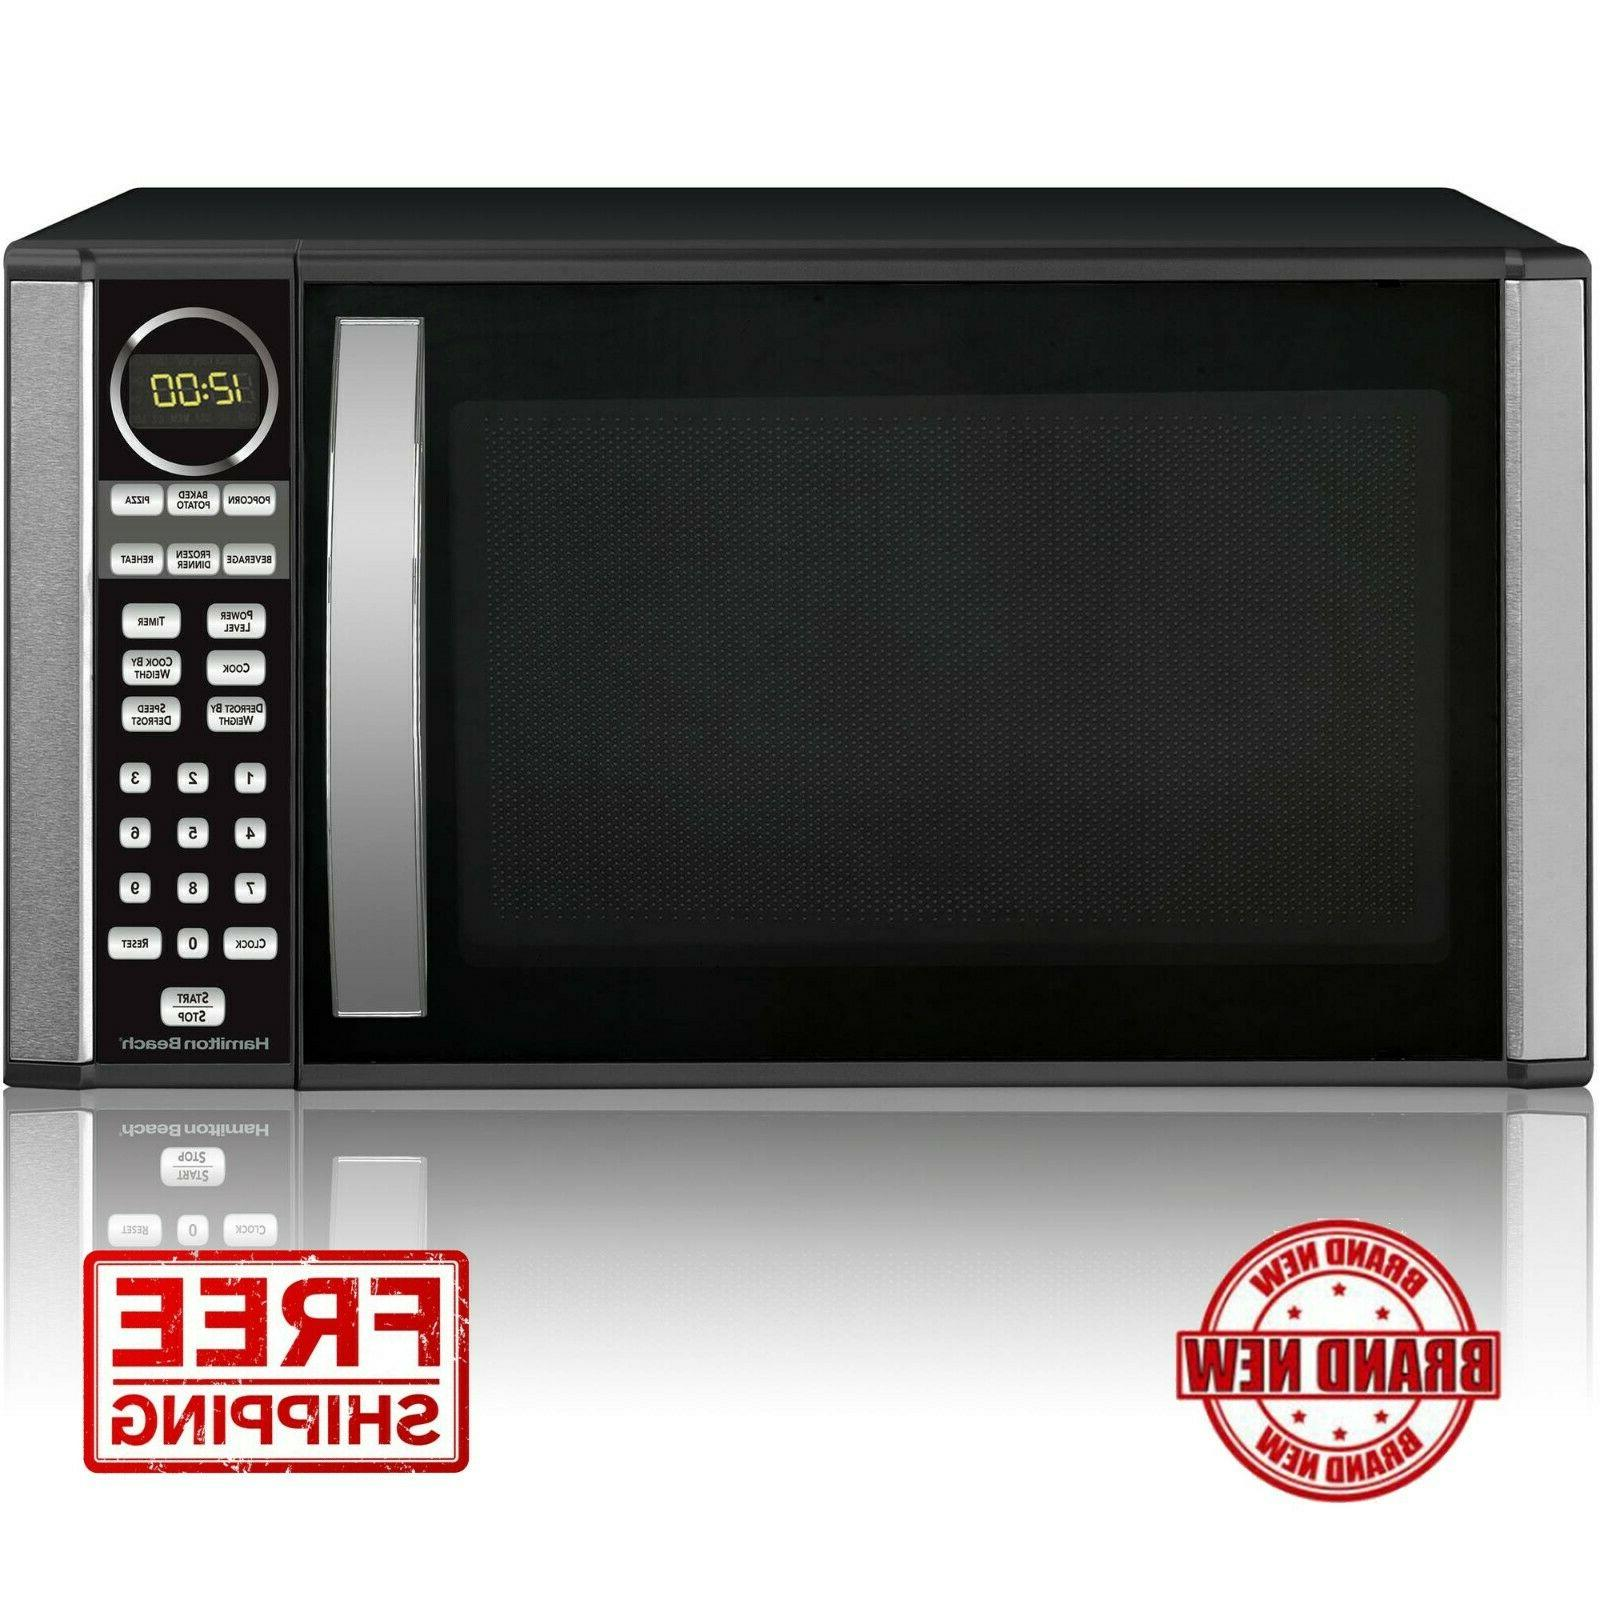 1 3 cu ft microwave oven black